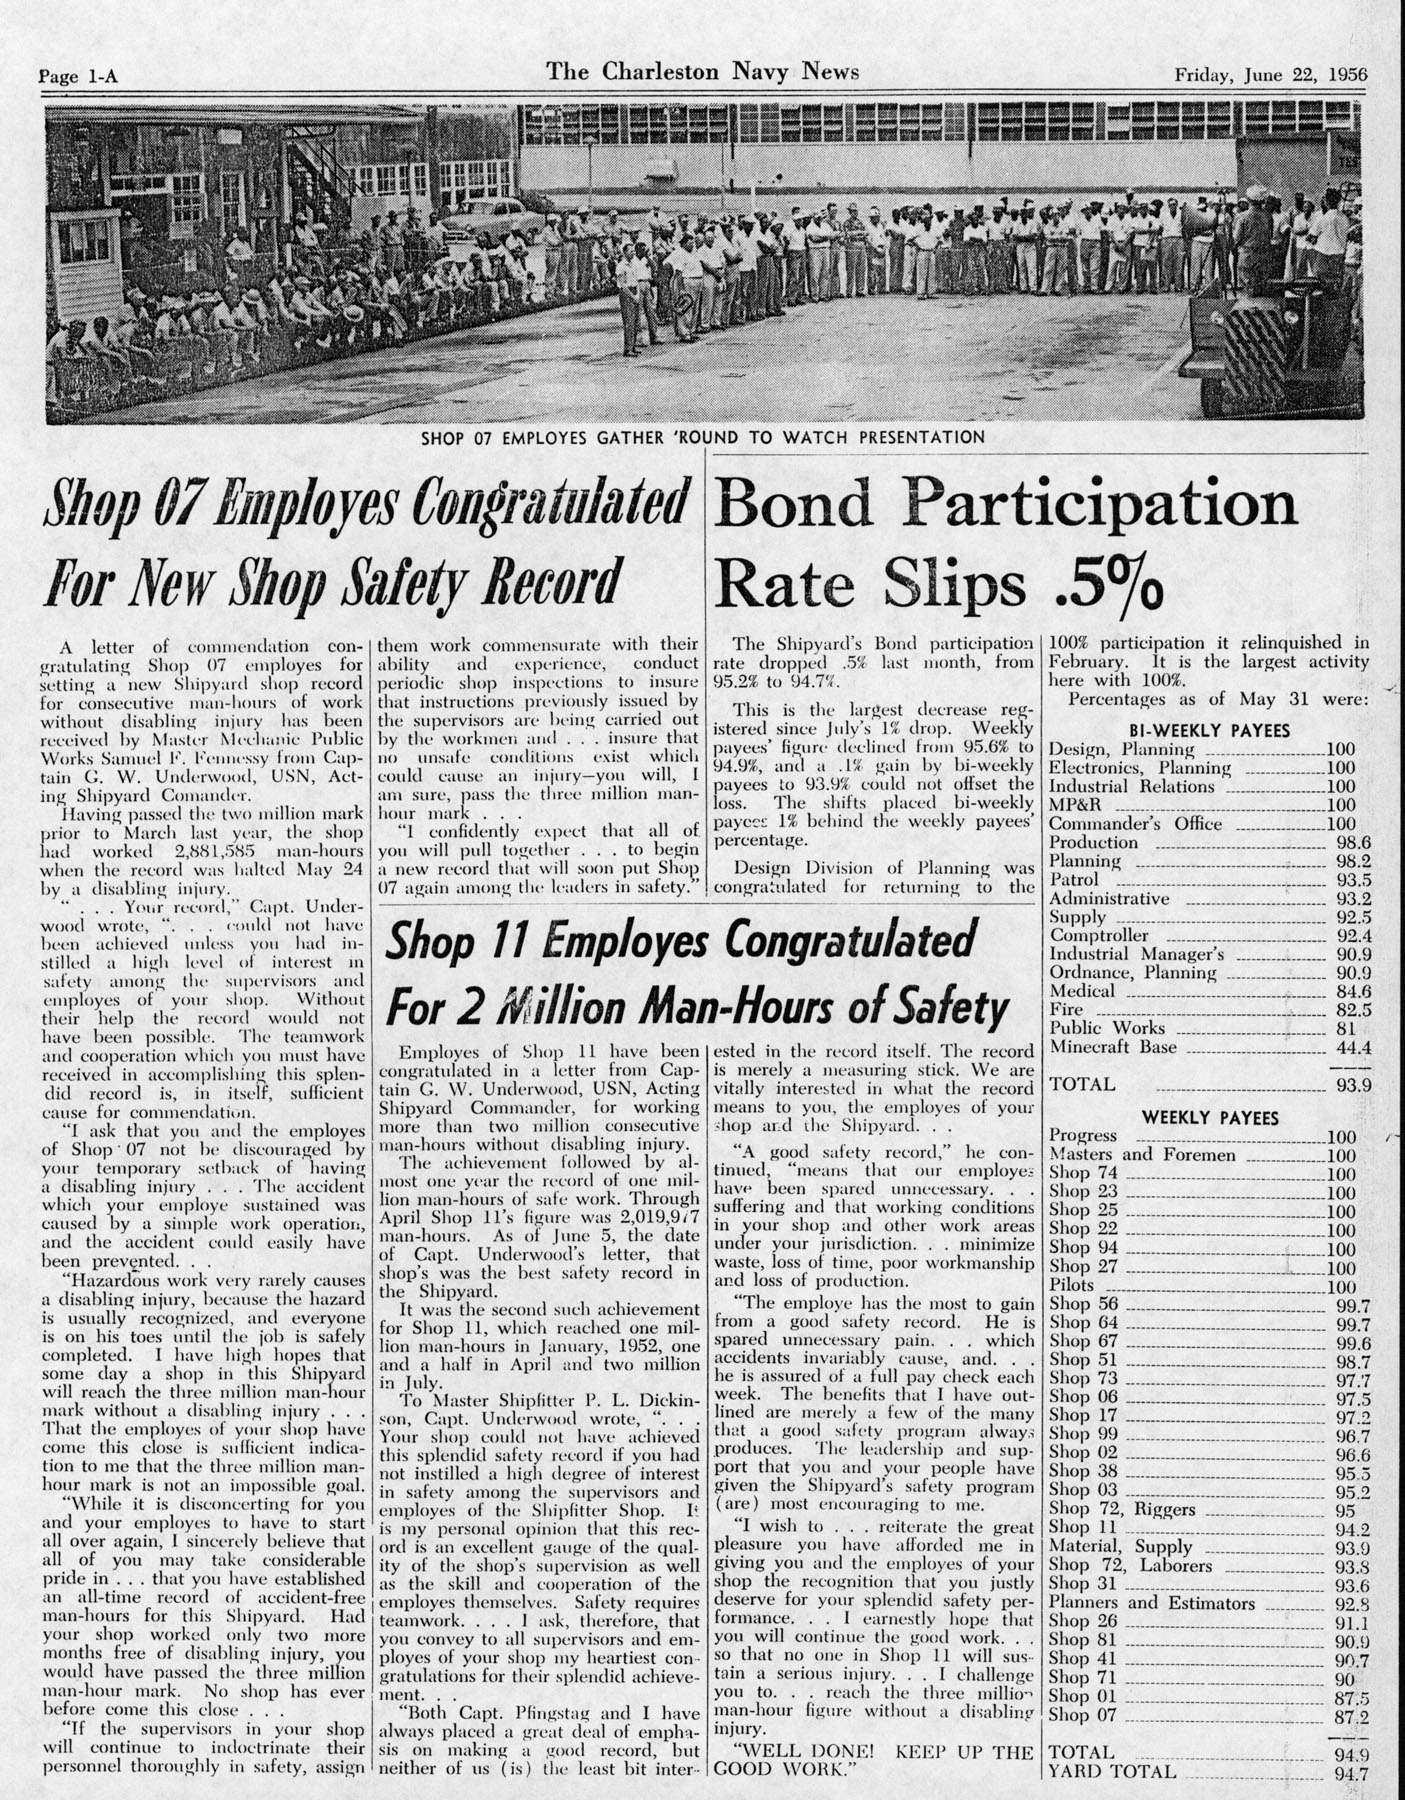 The Charleston Navy News, Volume 14, Edition 24, page ia